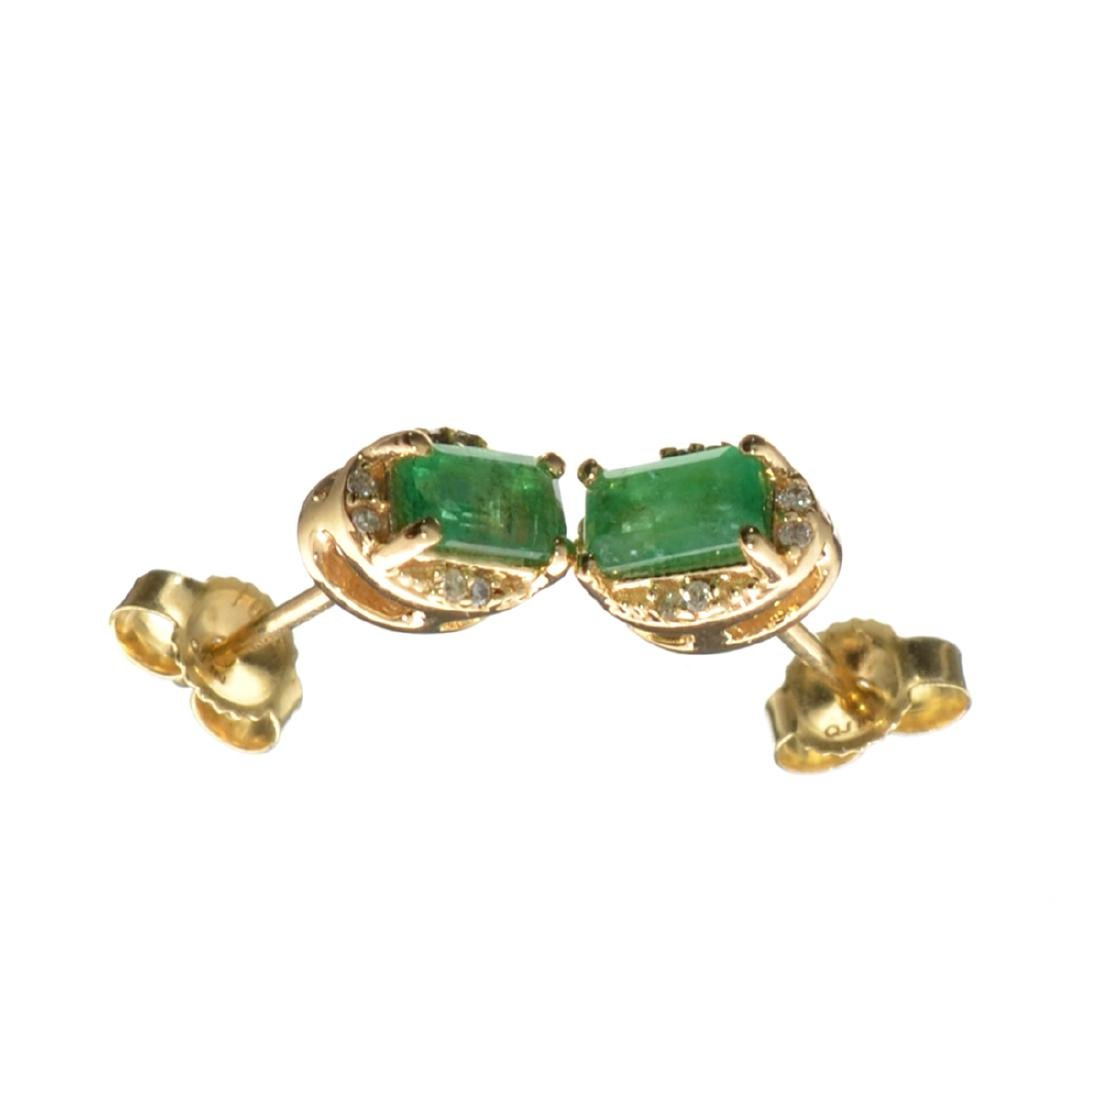 14KT Gold 0.58CT Rectangular Cut Emerald and 0.05CT